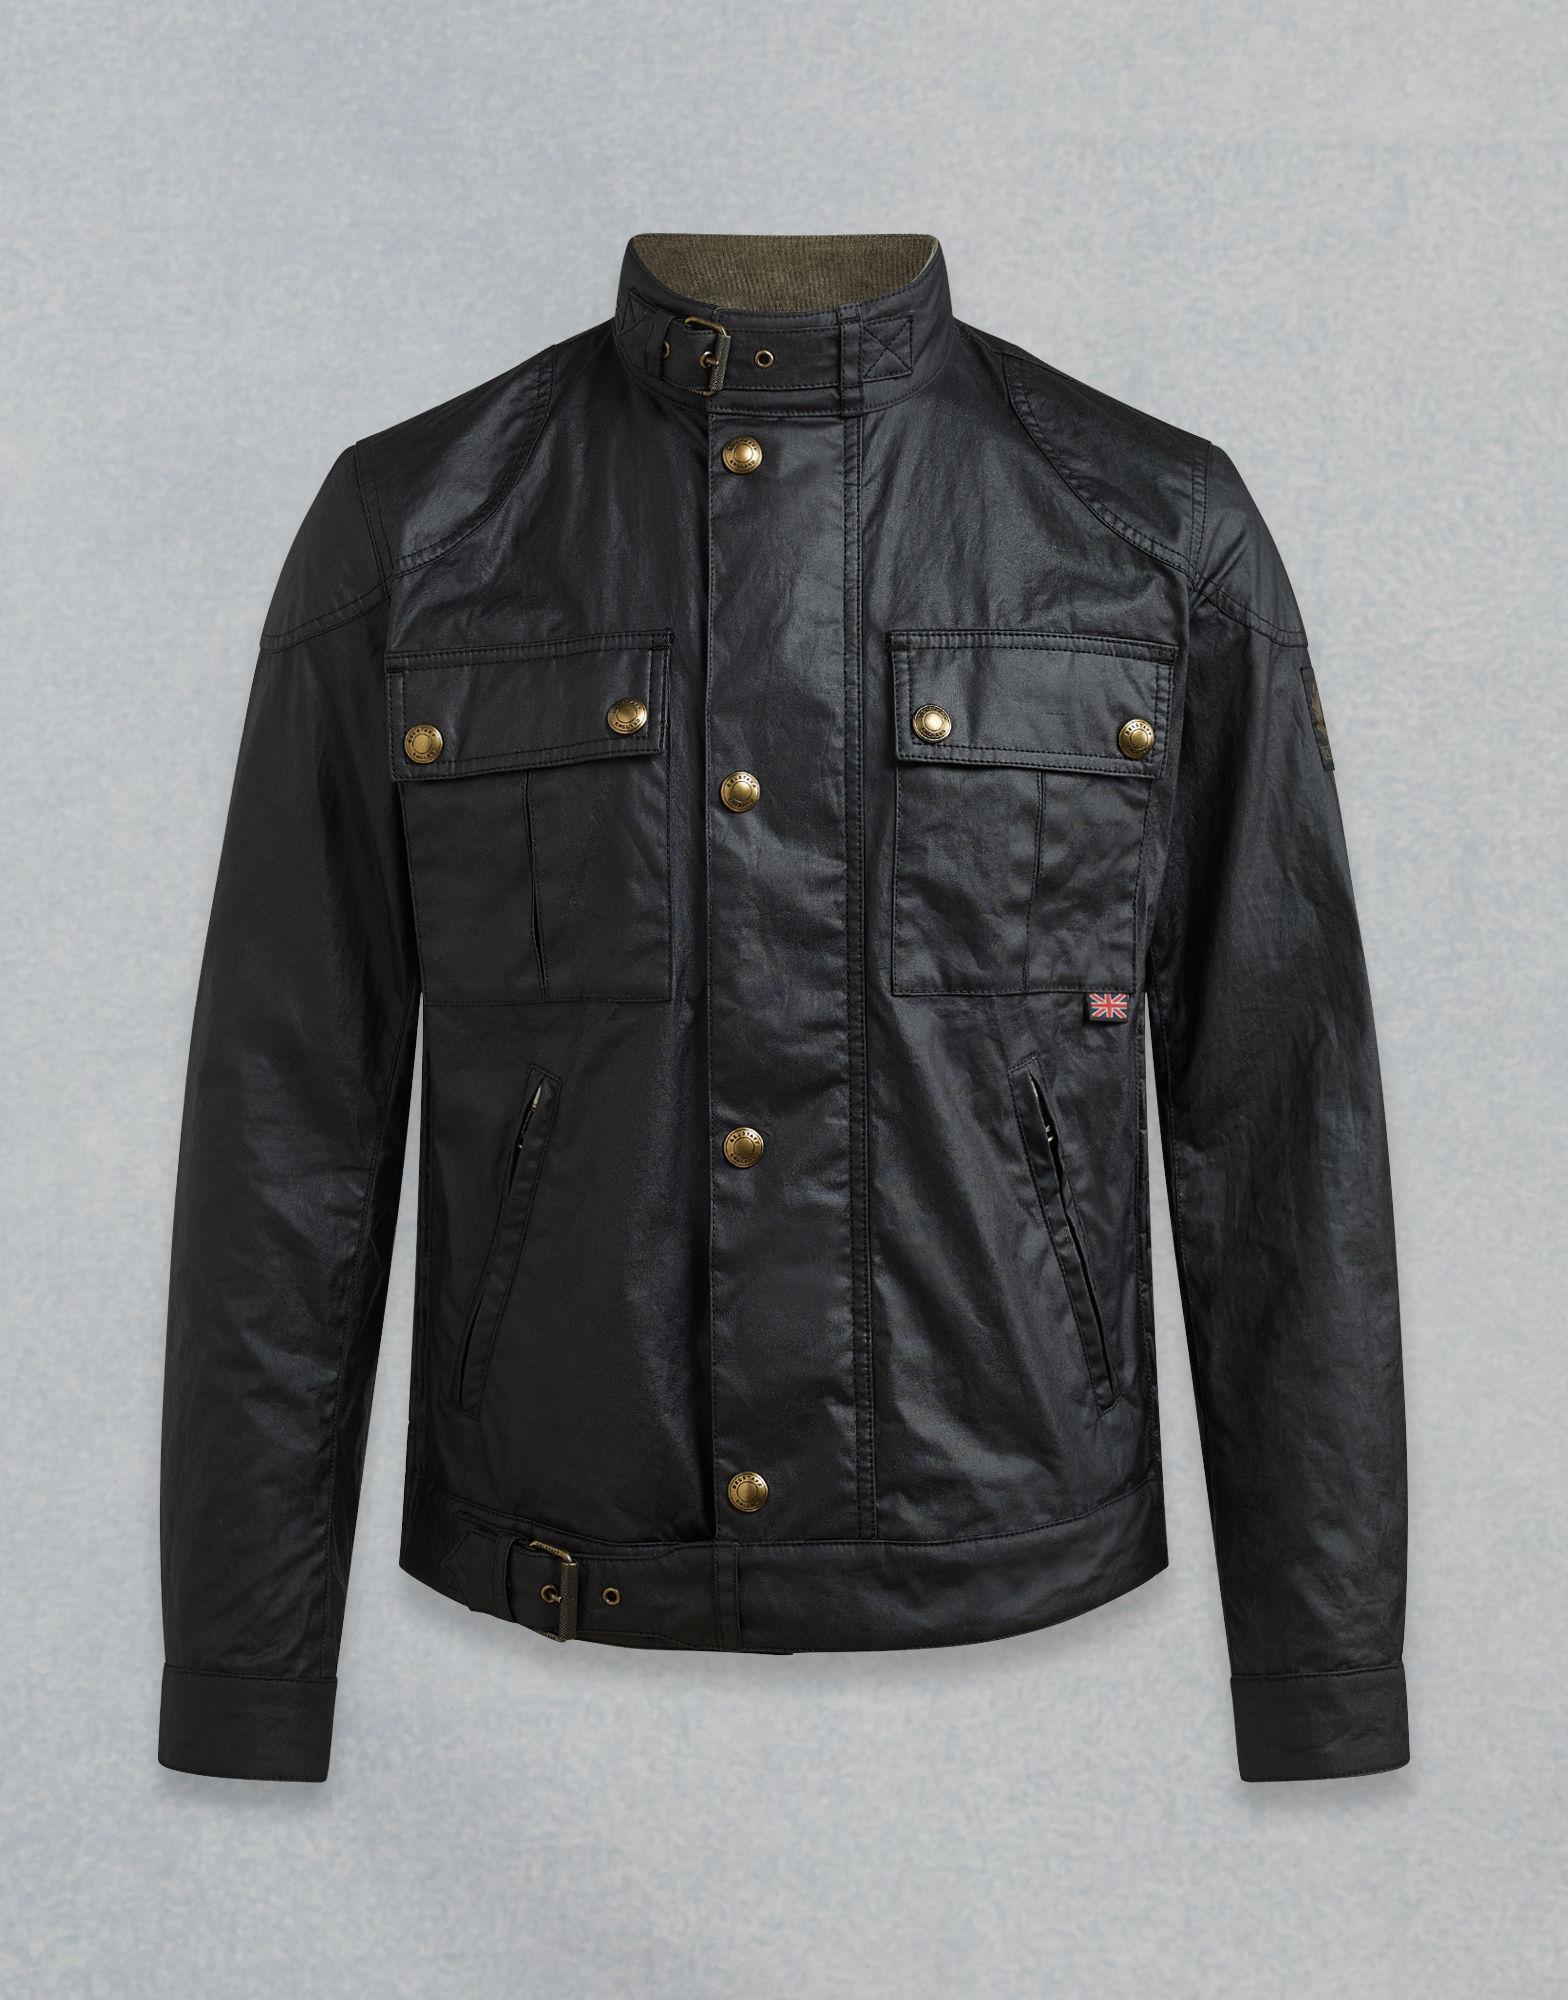 b3f07d5dd72f Belstaff Gangster Waxed Jacket in Black for Men - Save 8% - Lyst